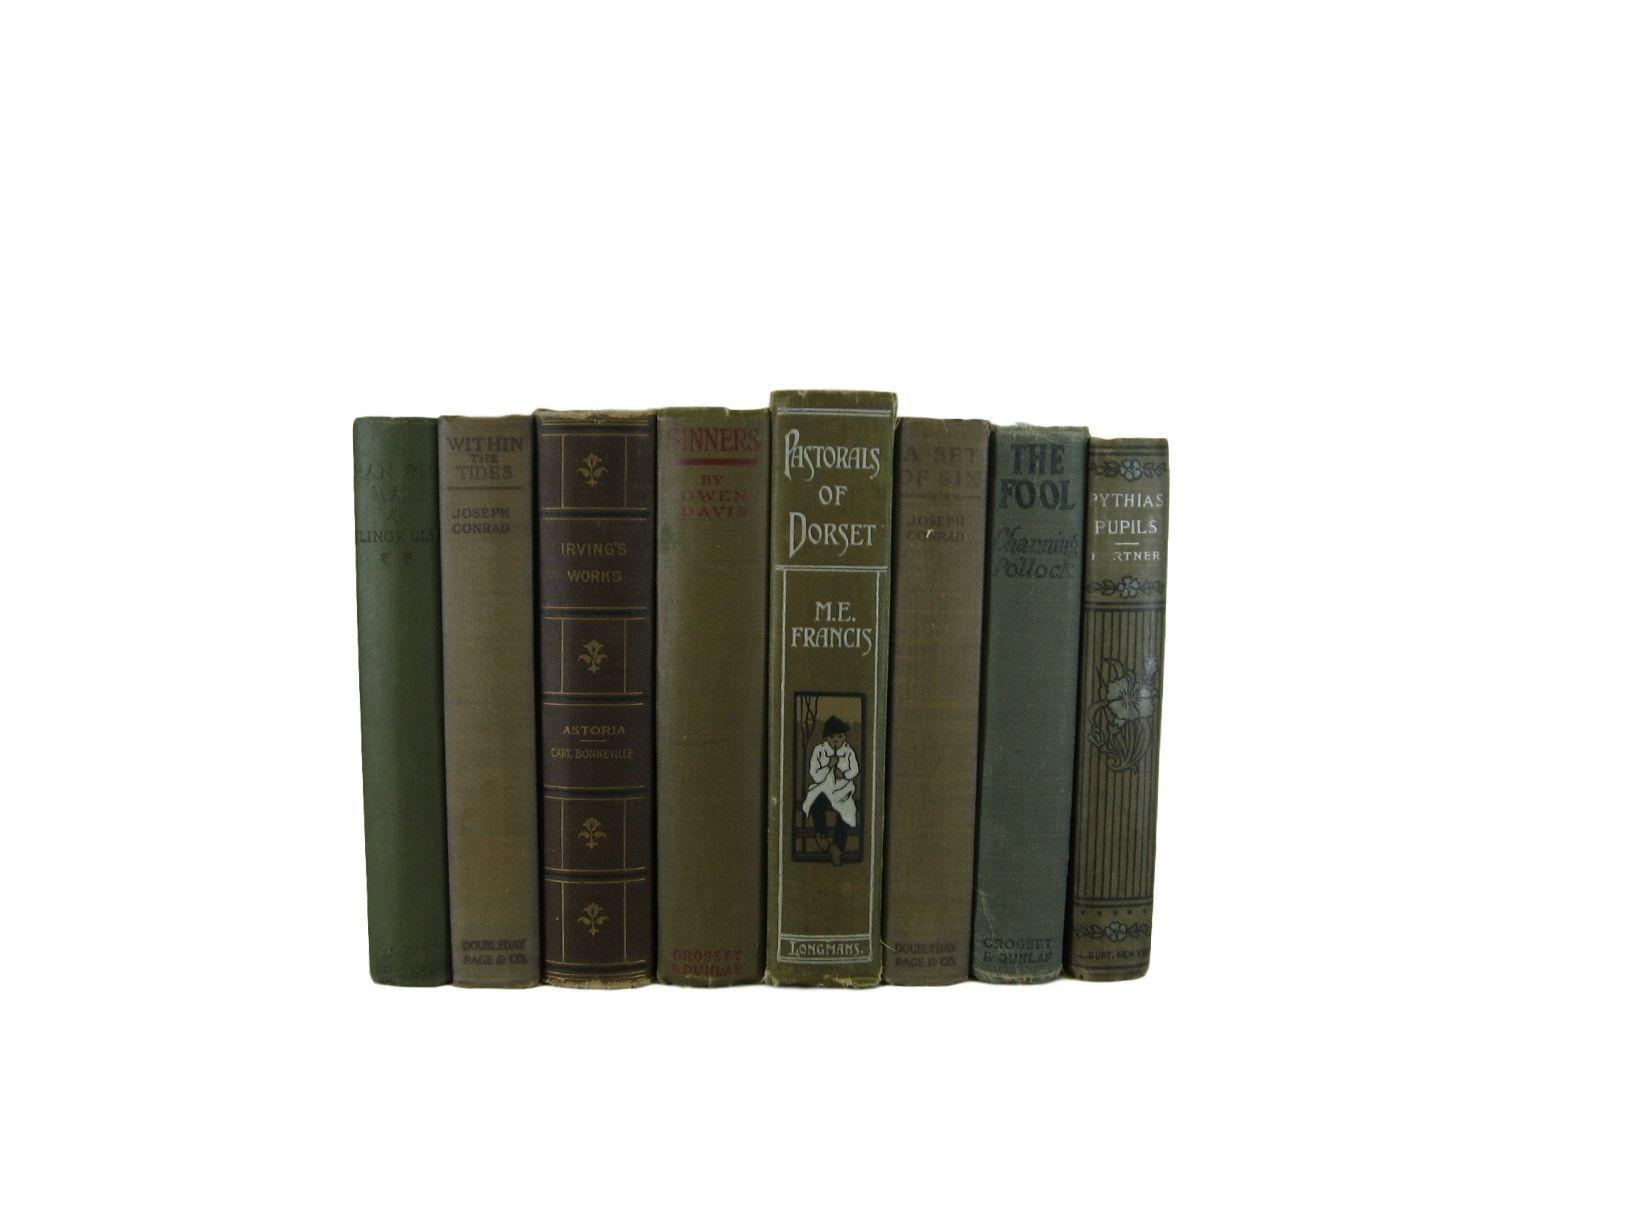 Green Bookshelf Vintage Book Set, S/8 #DecadesofVintage #bookhomedecor #booksbycolor #bookshelfdecor #decorativebooks #homedecor #interiordesign #oldbooks #stagingprop #vintagebookdecor #vintagebooks #vintagehomedecor